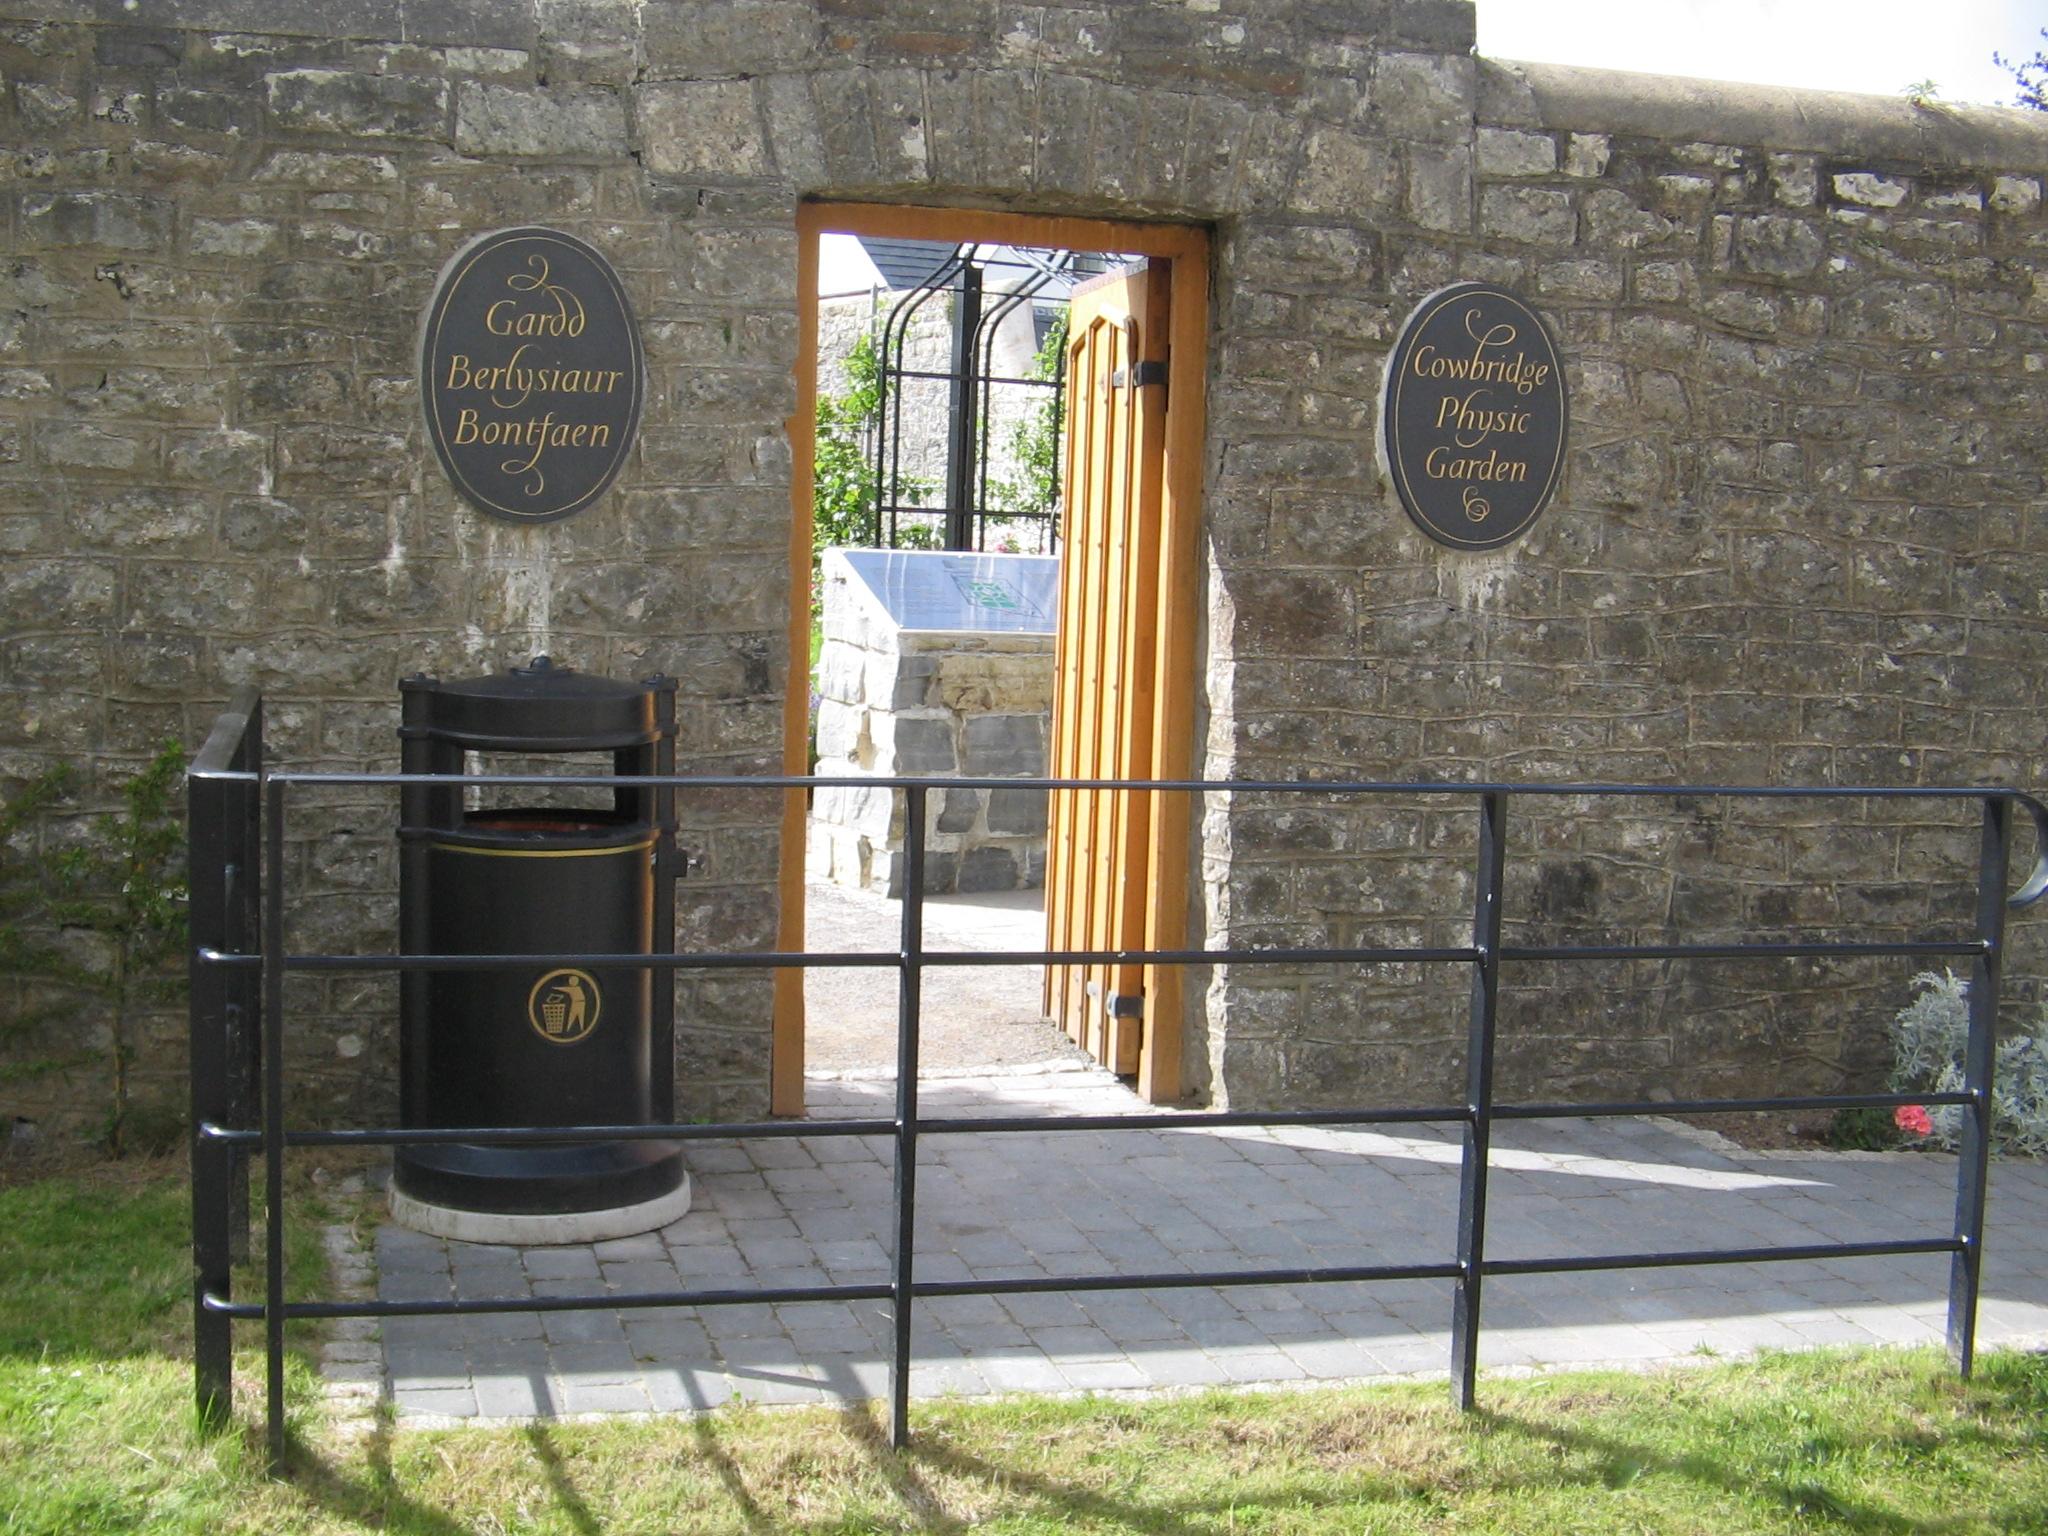 Physic garden wikipedia - File Walled Physic Garden Cowbridge Wales Panoramio Jpg